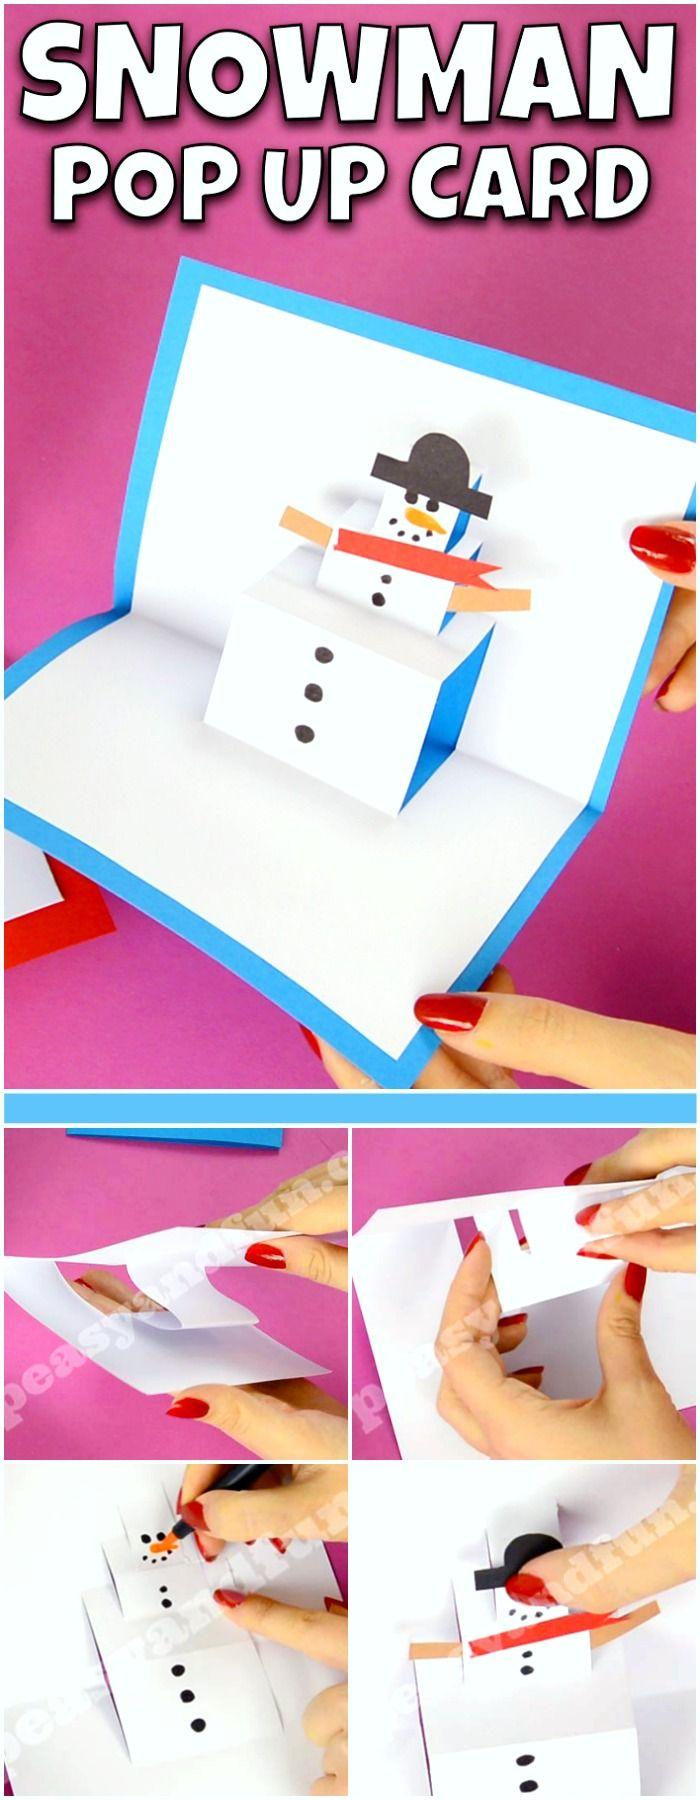 Cute DIY Snowman Pop Up Card. Fun DIY Christmas craft idea for kids to make.